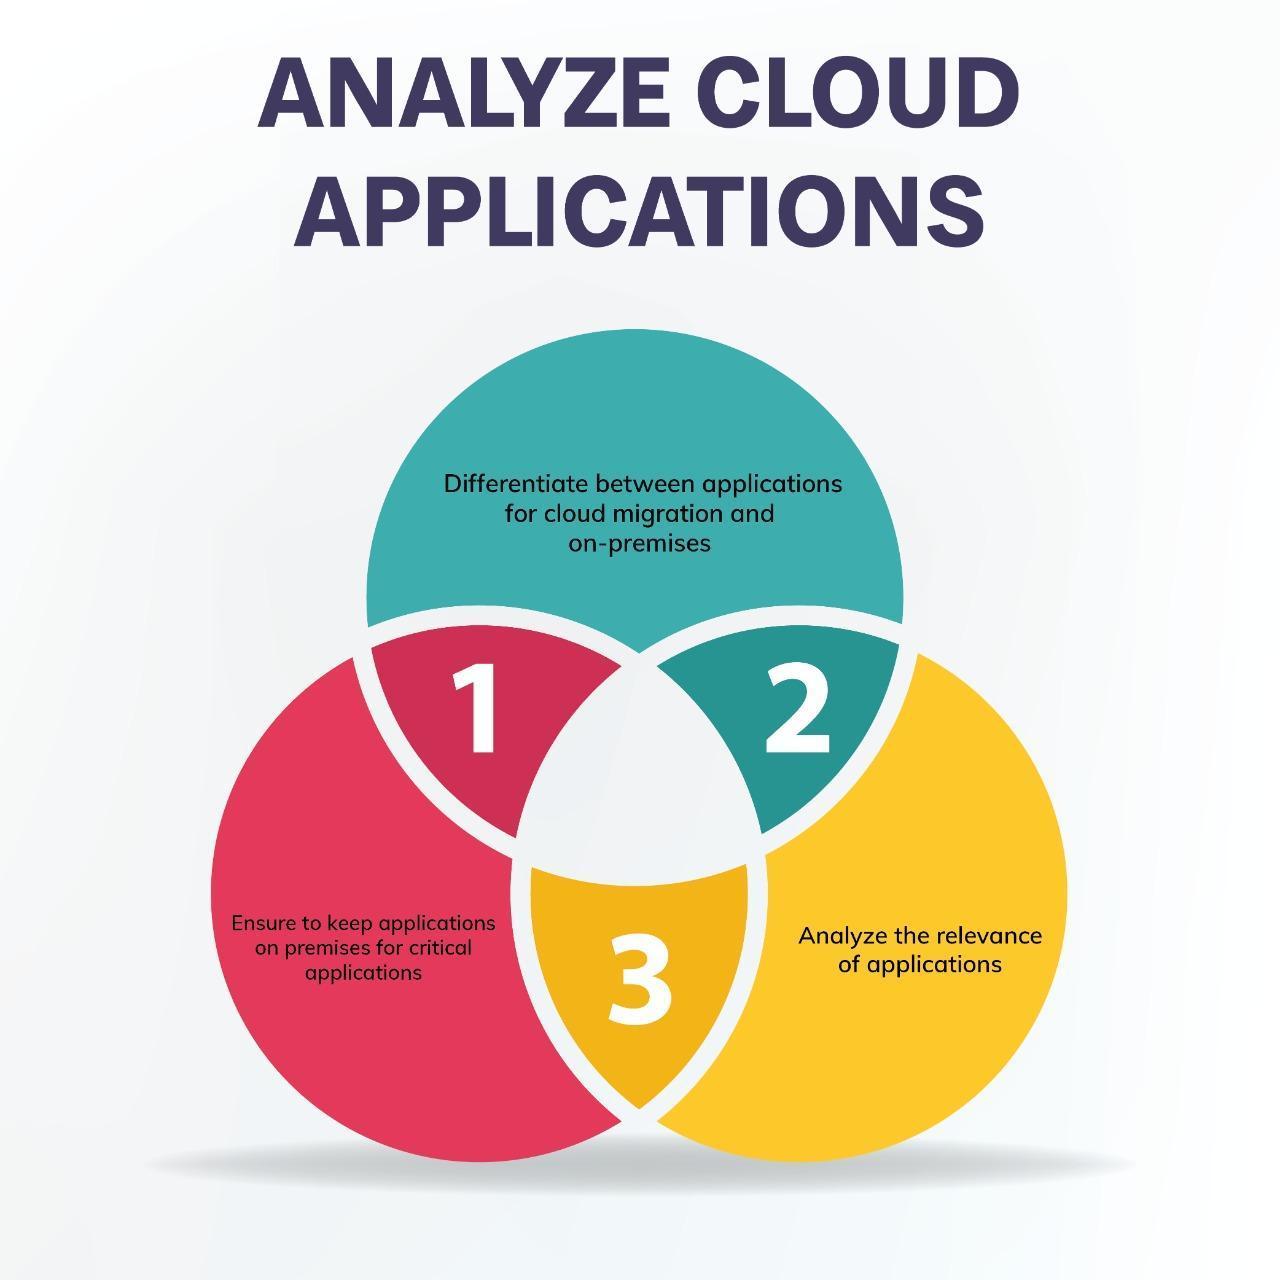 Analyze cloud applications